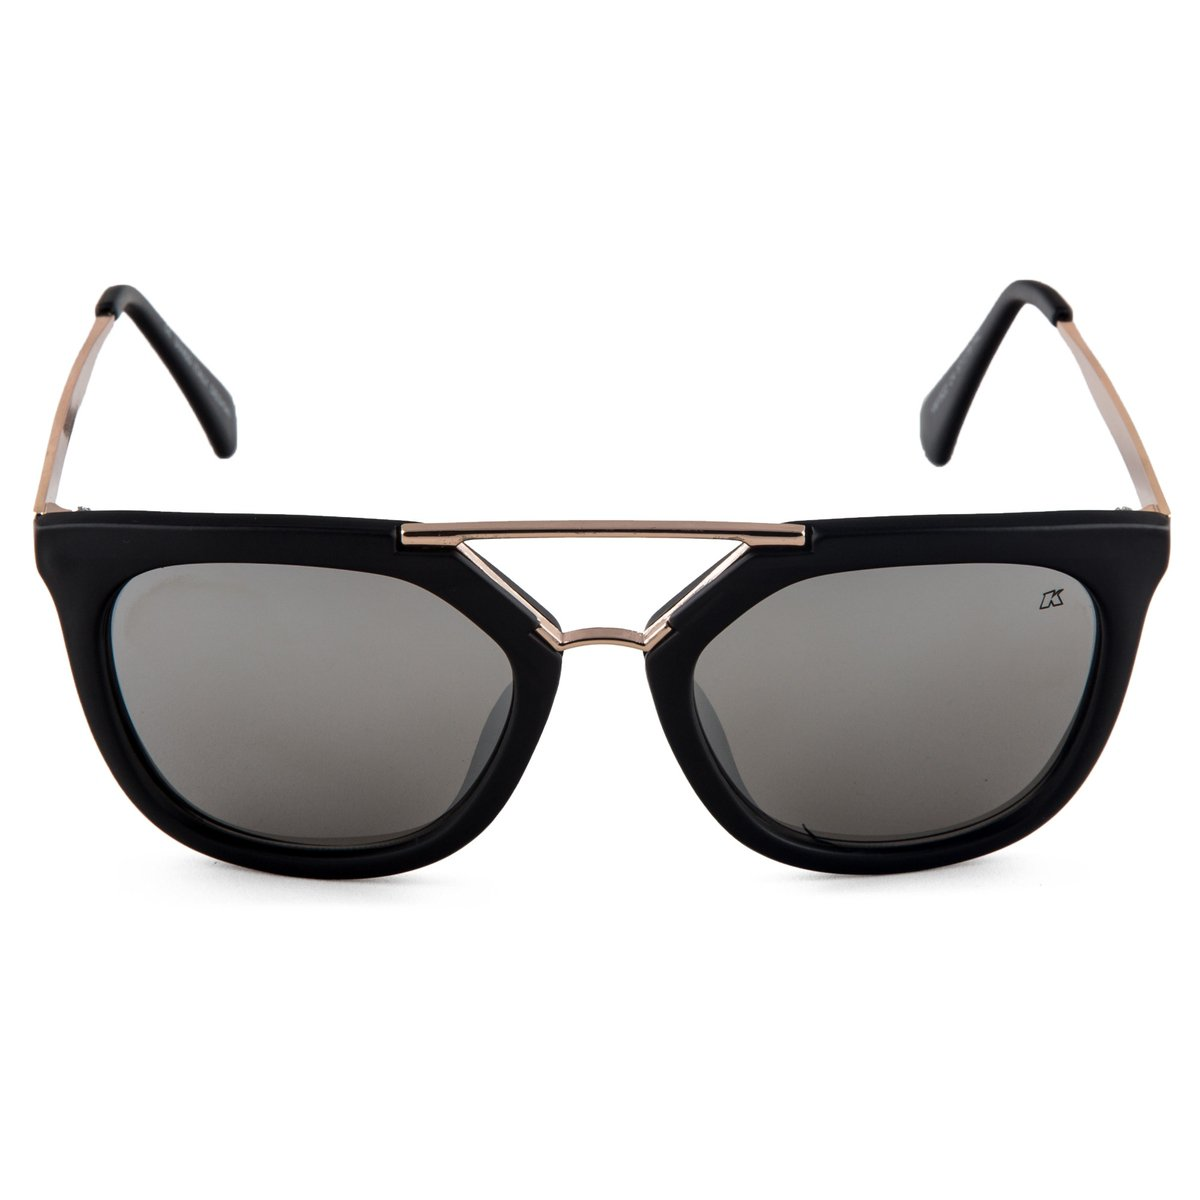 bc88cff71a411 Óculos de Sol Khatto YM1522 - Compre Agora   Zattini